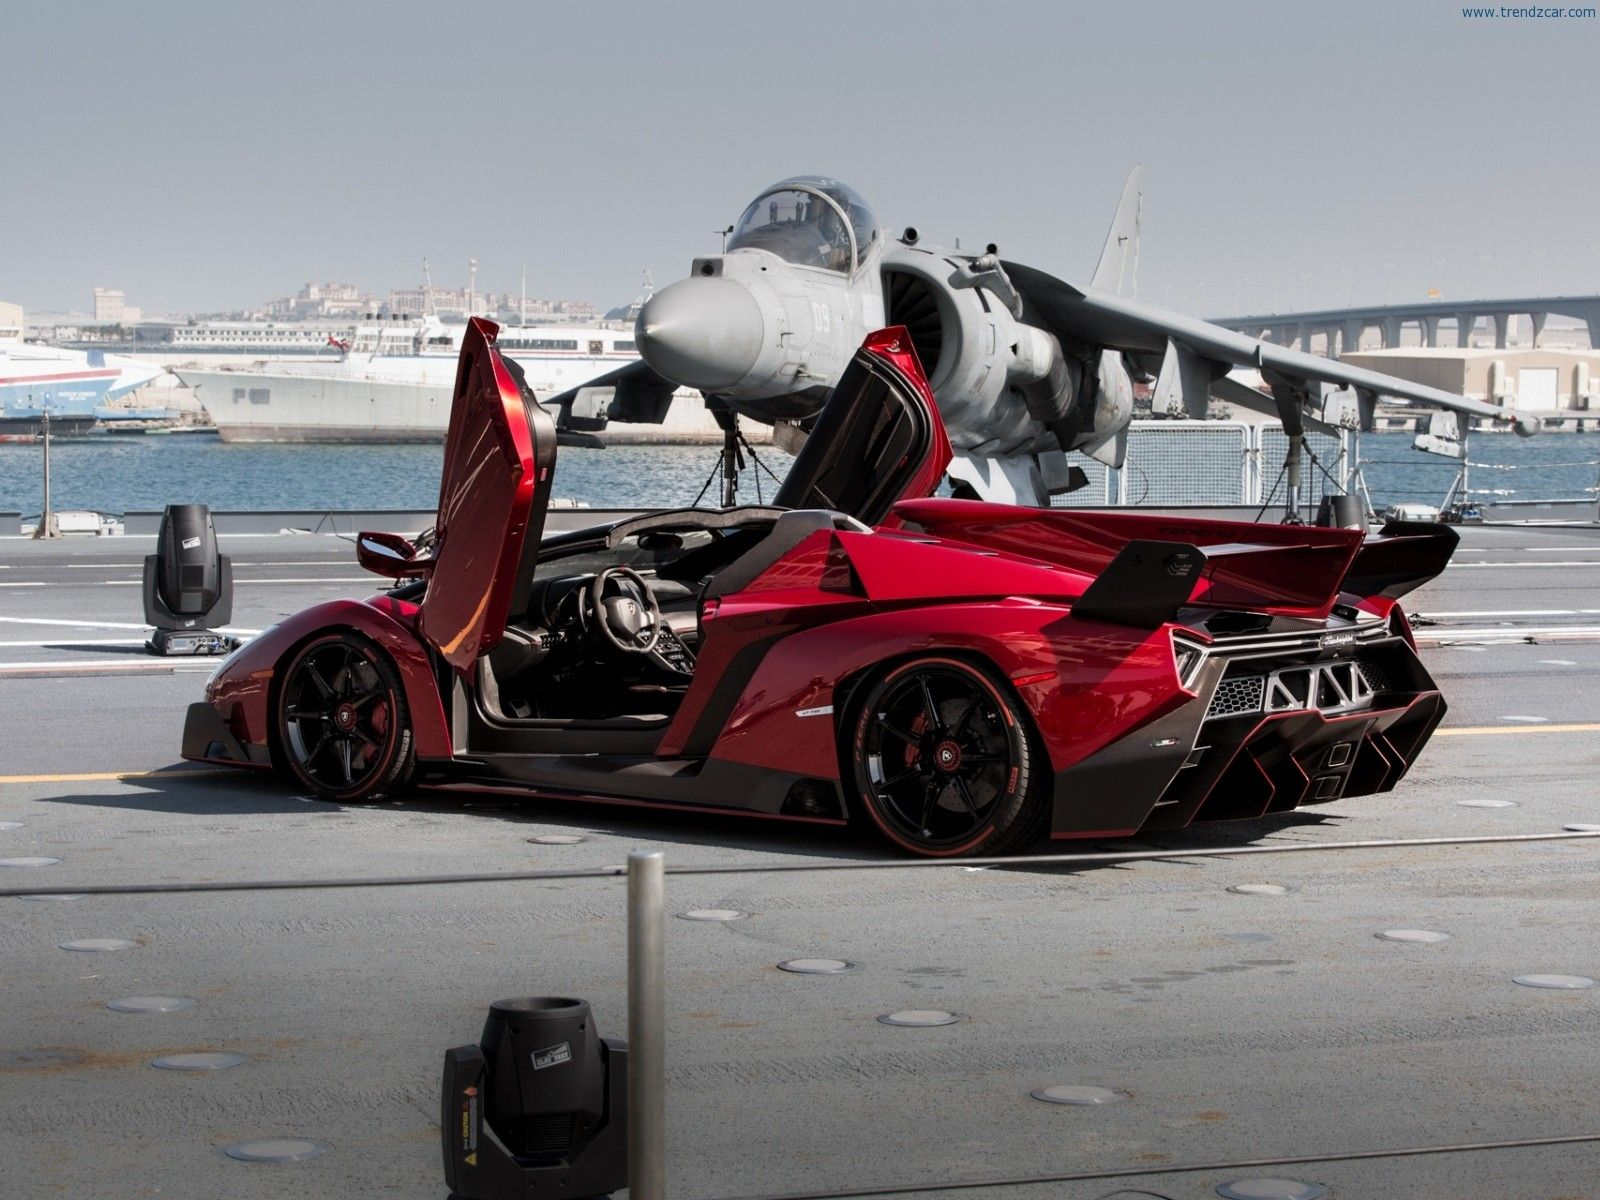 7254cd2bf70de4add7c1b15ca78fcd58 Marvelous Photo Ferrari Mondial 8 Quattrovalvole Rouge Occasion Cars Trend